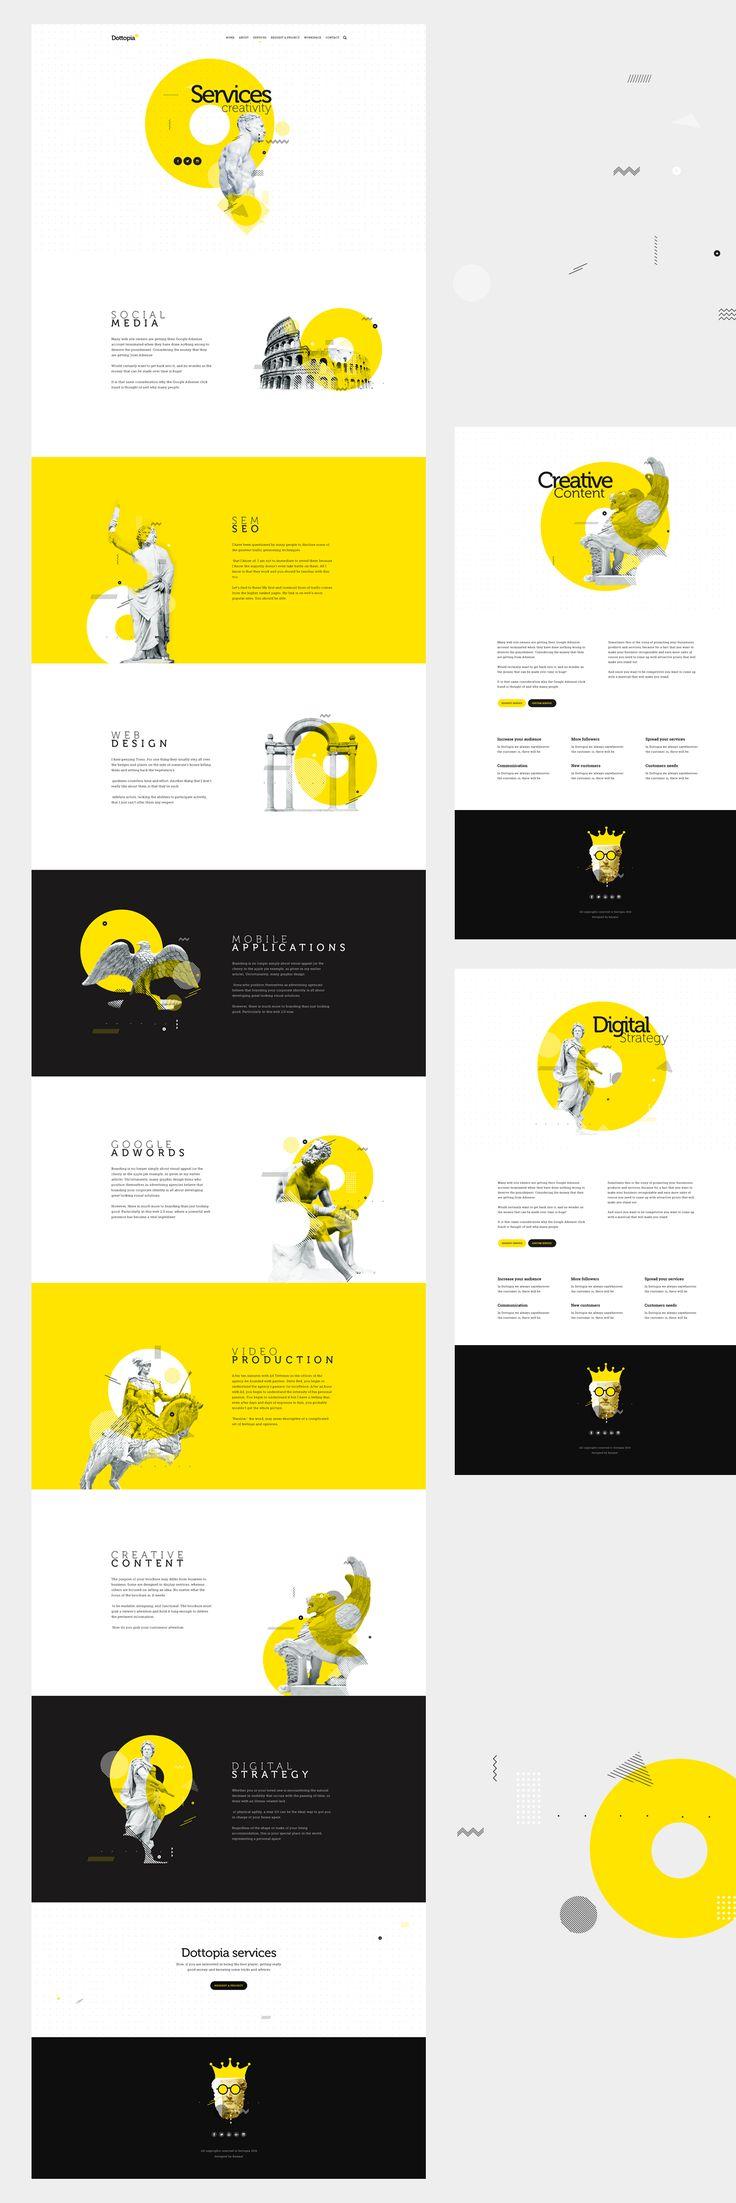 best webonudas images on pinterest charts page layout and web